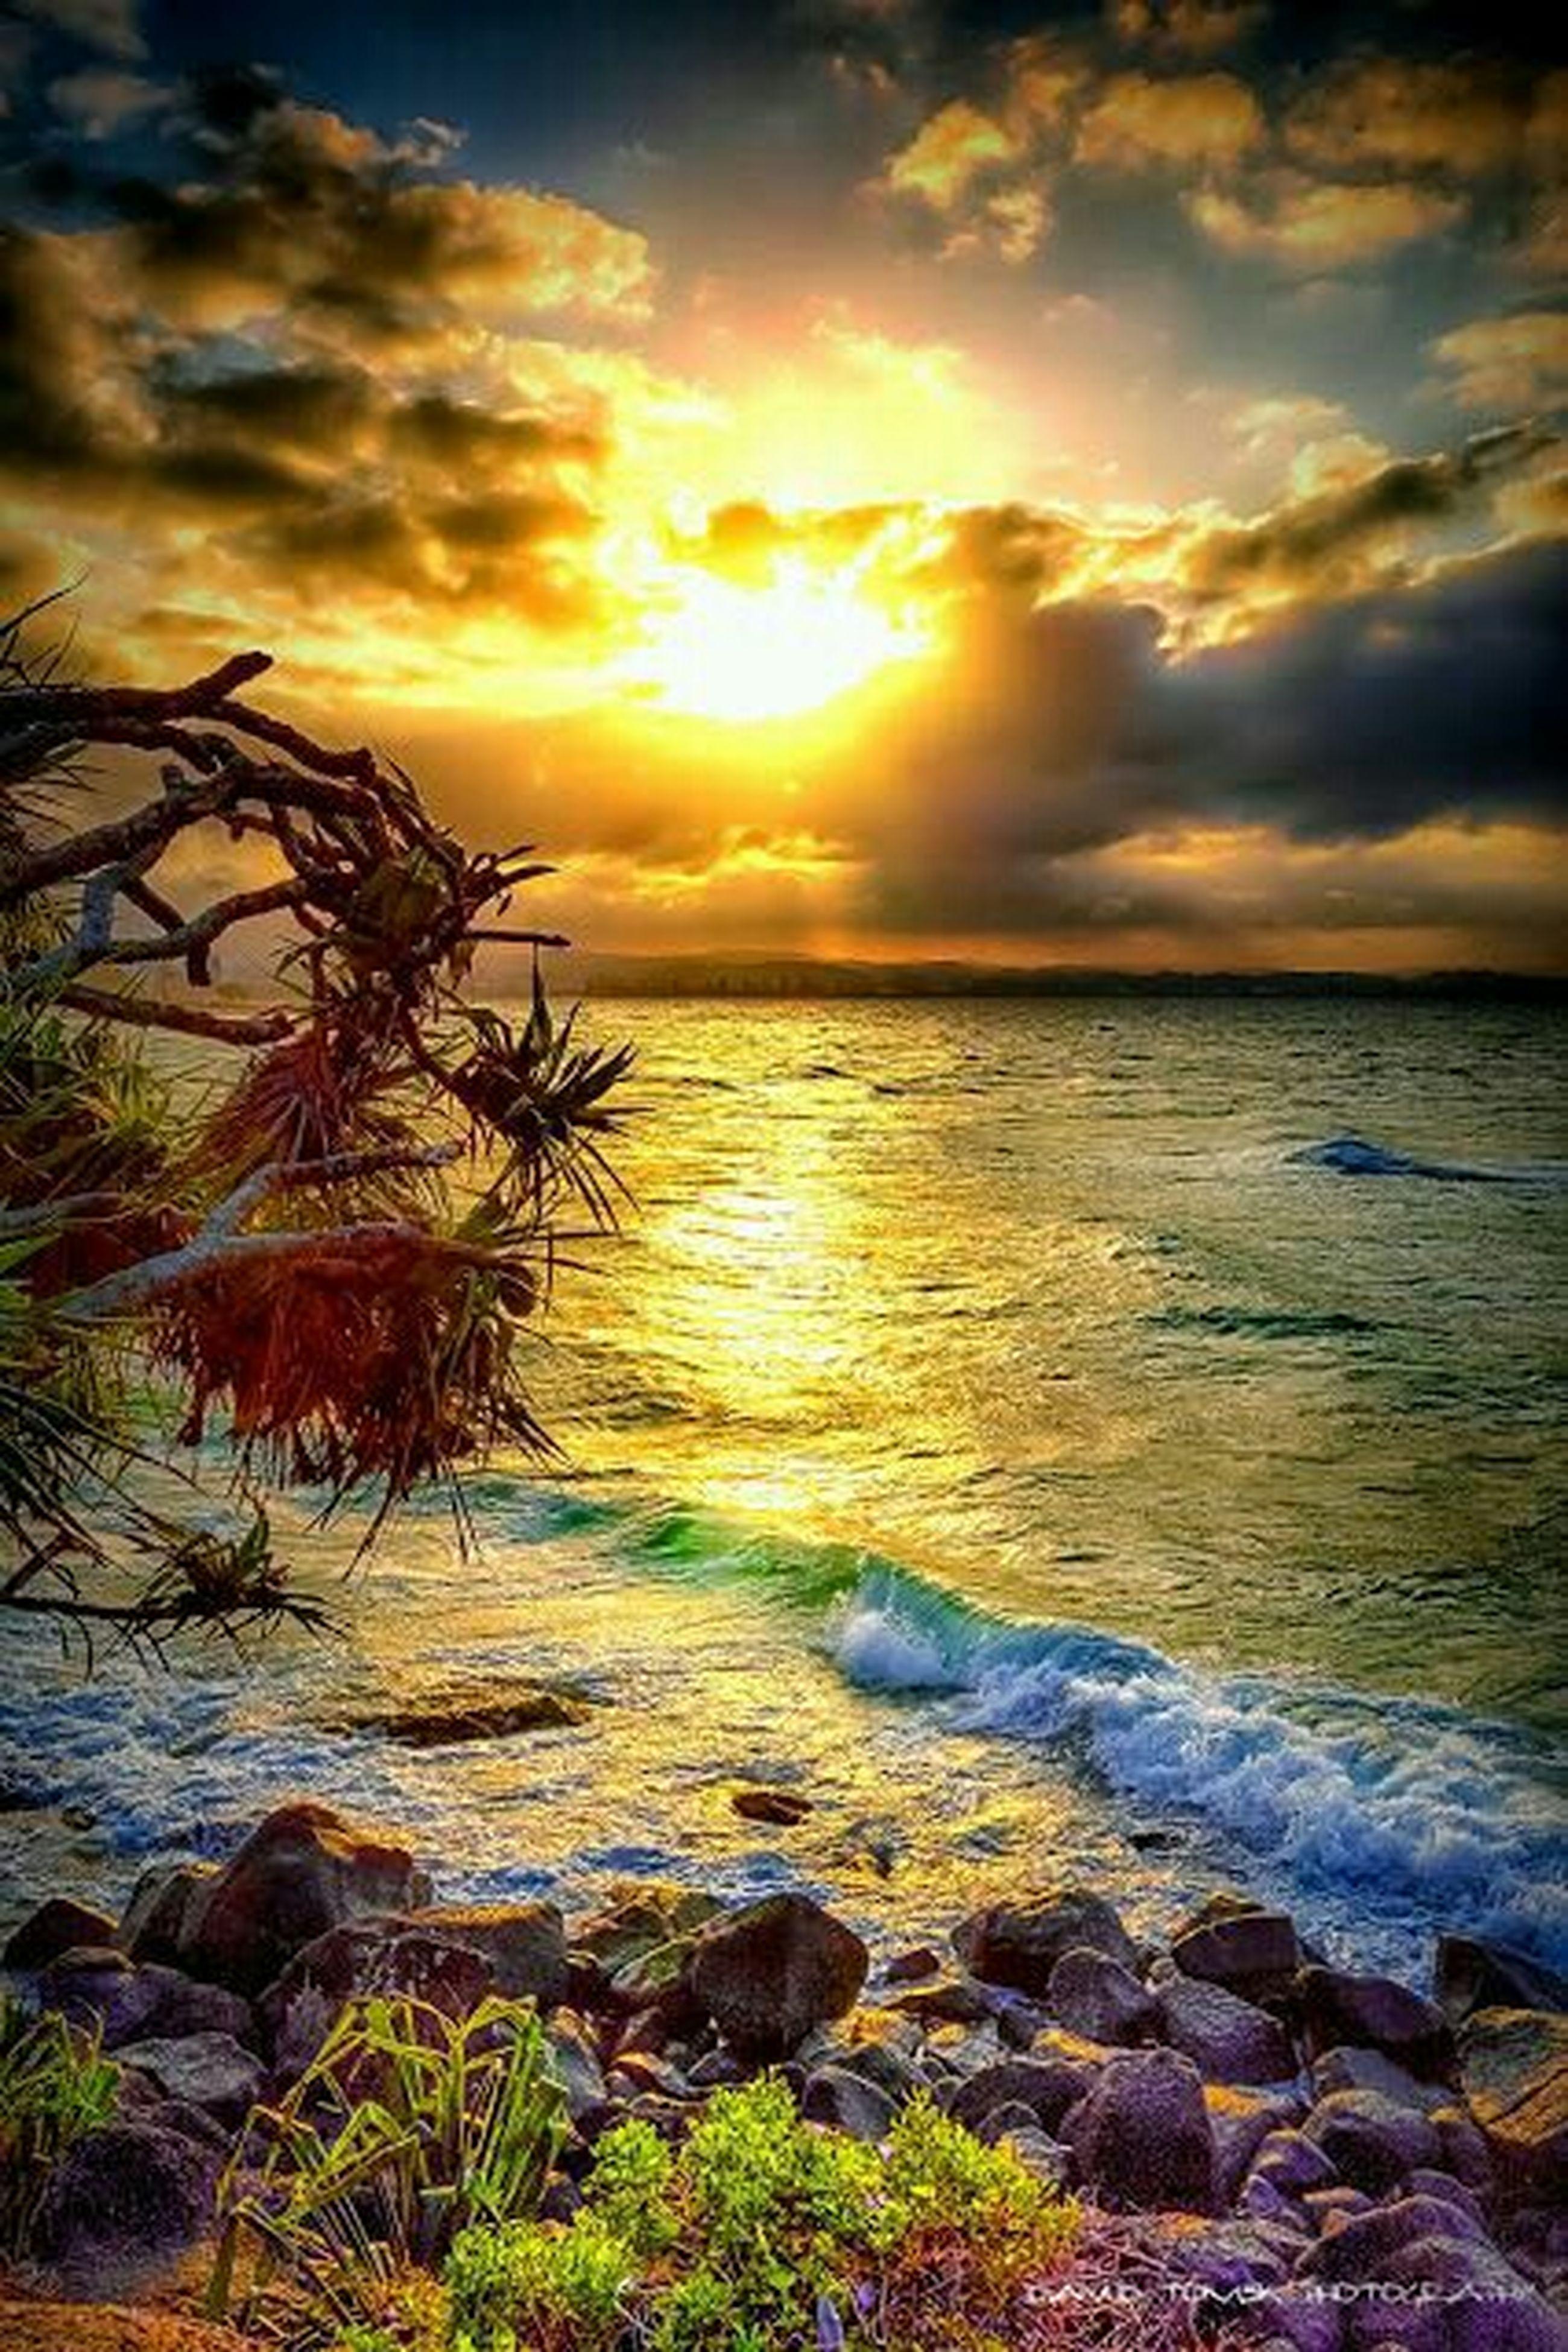 water, sunset, sea, tranquil scene, horizon over water, scenics, sky, beauty in nature, tranquility, sun, beach, nature, shore, cloud - sky, idyllic, orange color, rock - object, sunlight, cloud, reflection